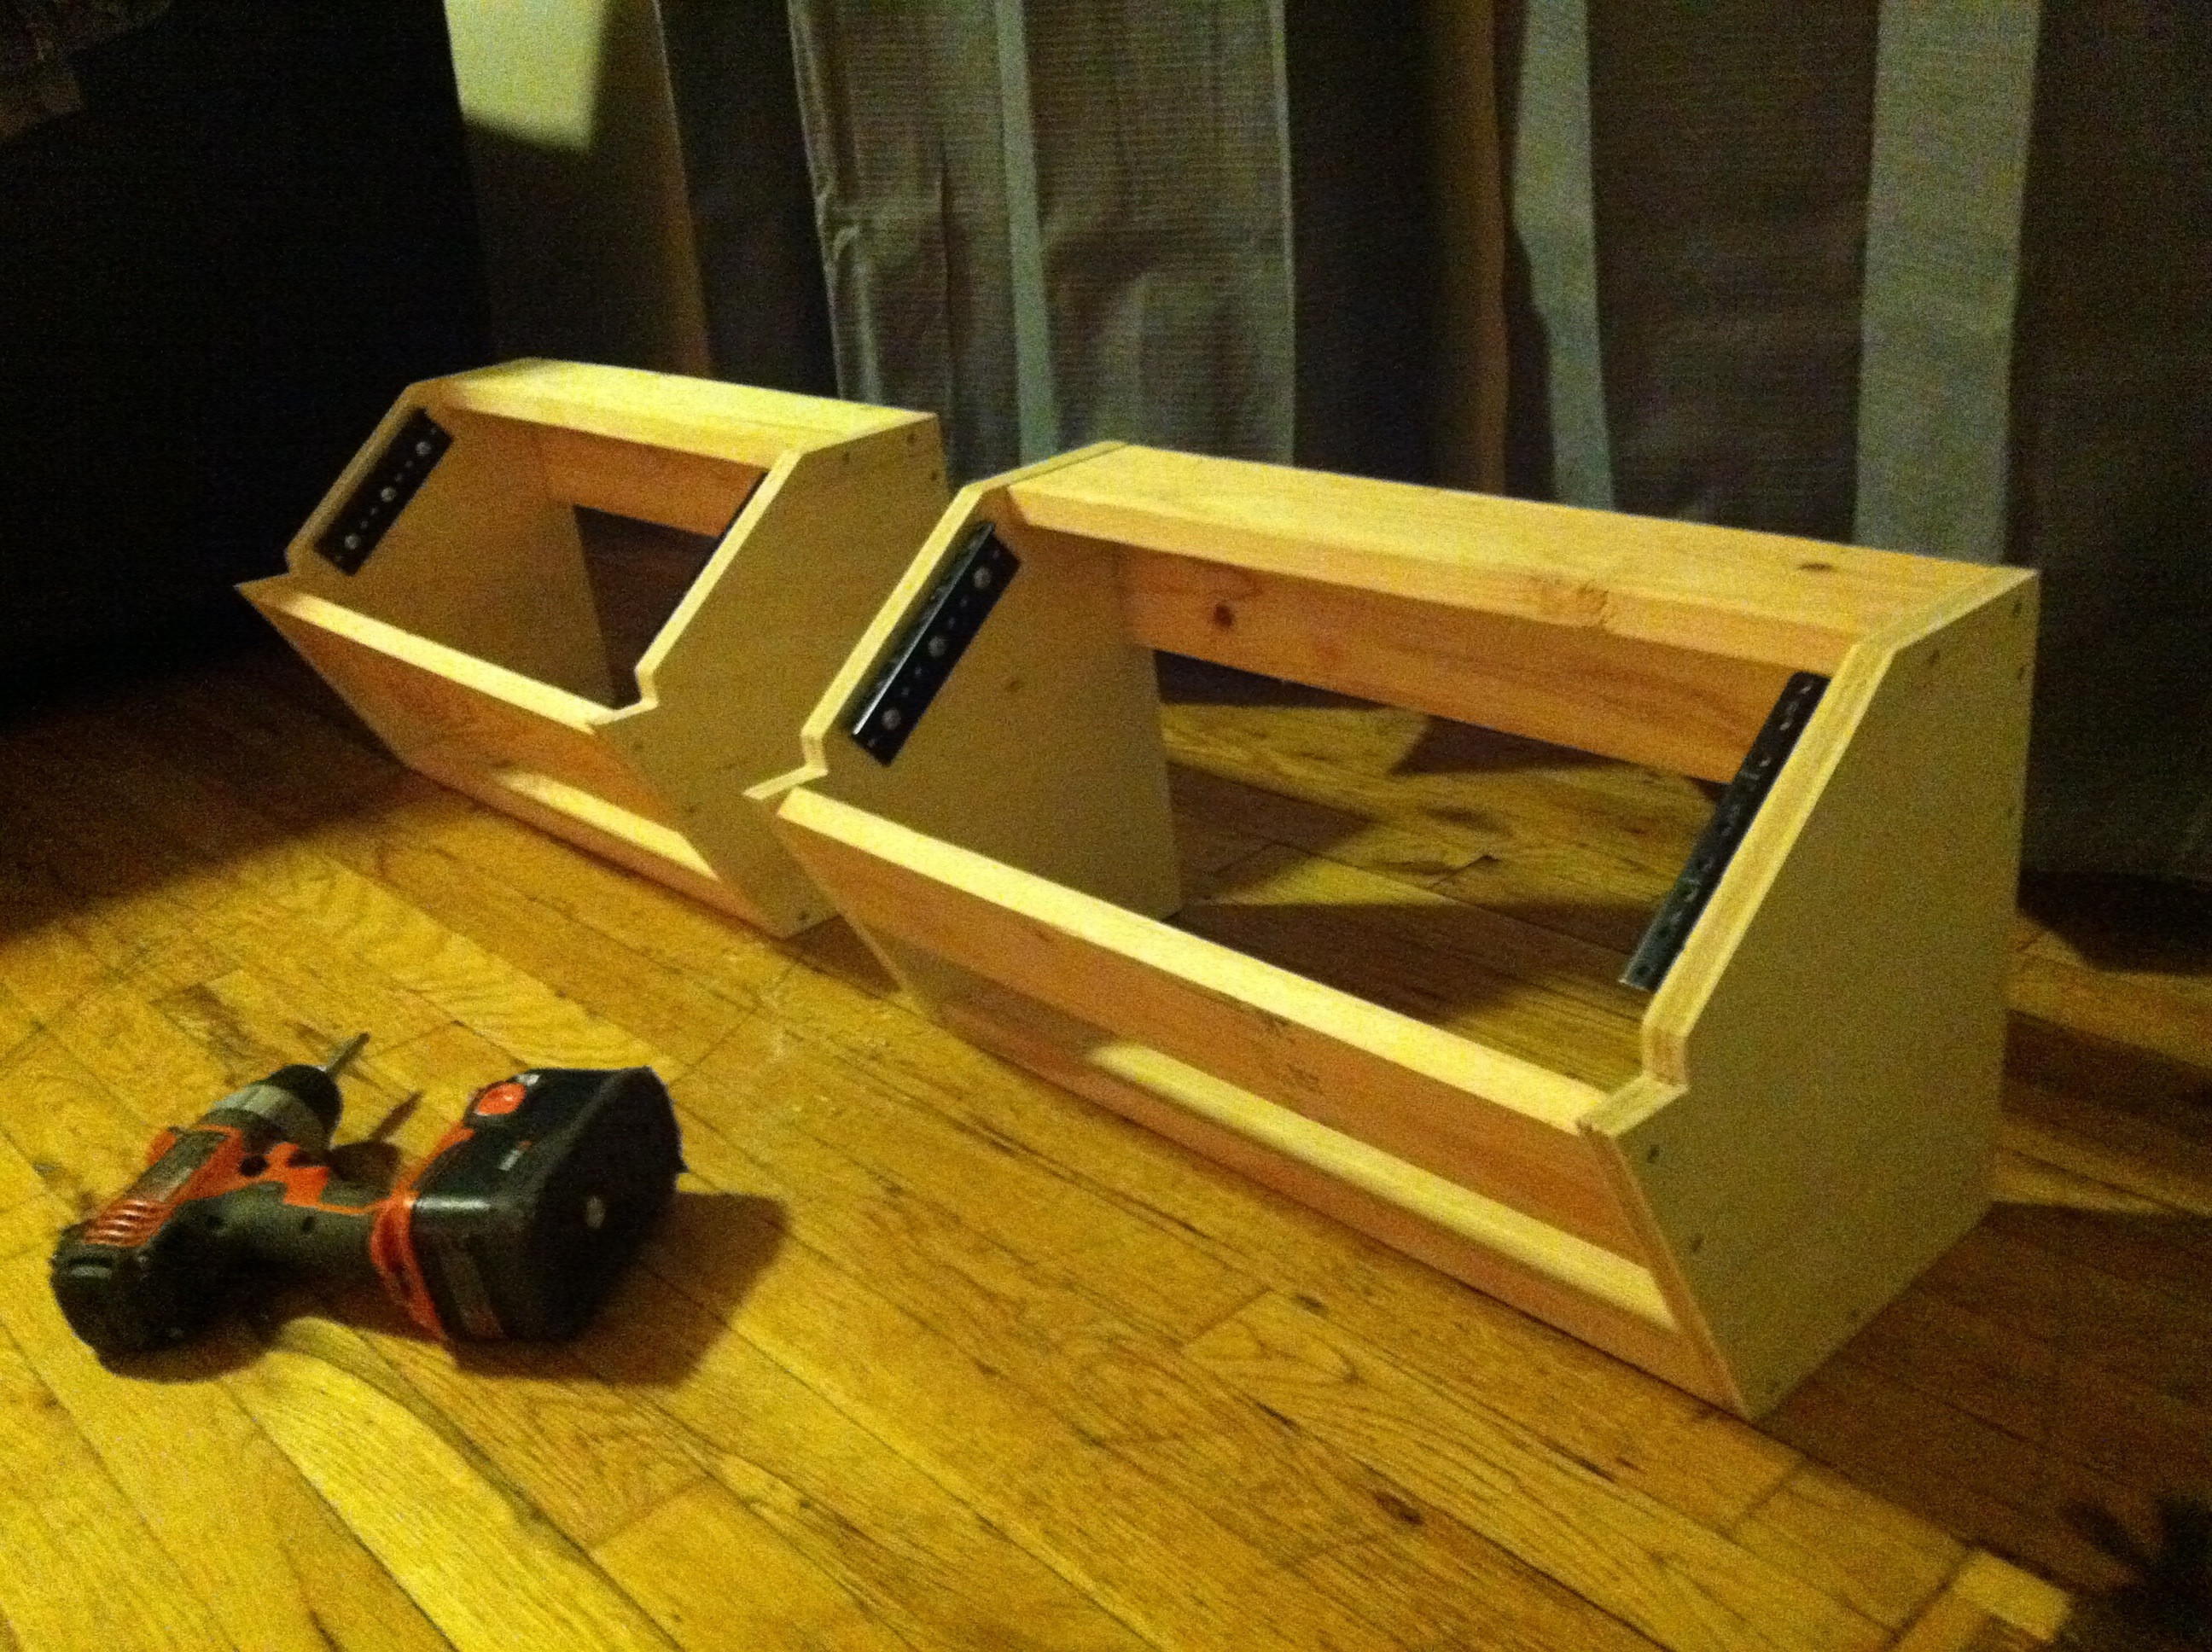 Best ideas about DIY Studio Rack Plans . Save or Pin DIY Studio Desk Keyboard Workstation under 0 img 1601 Now.